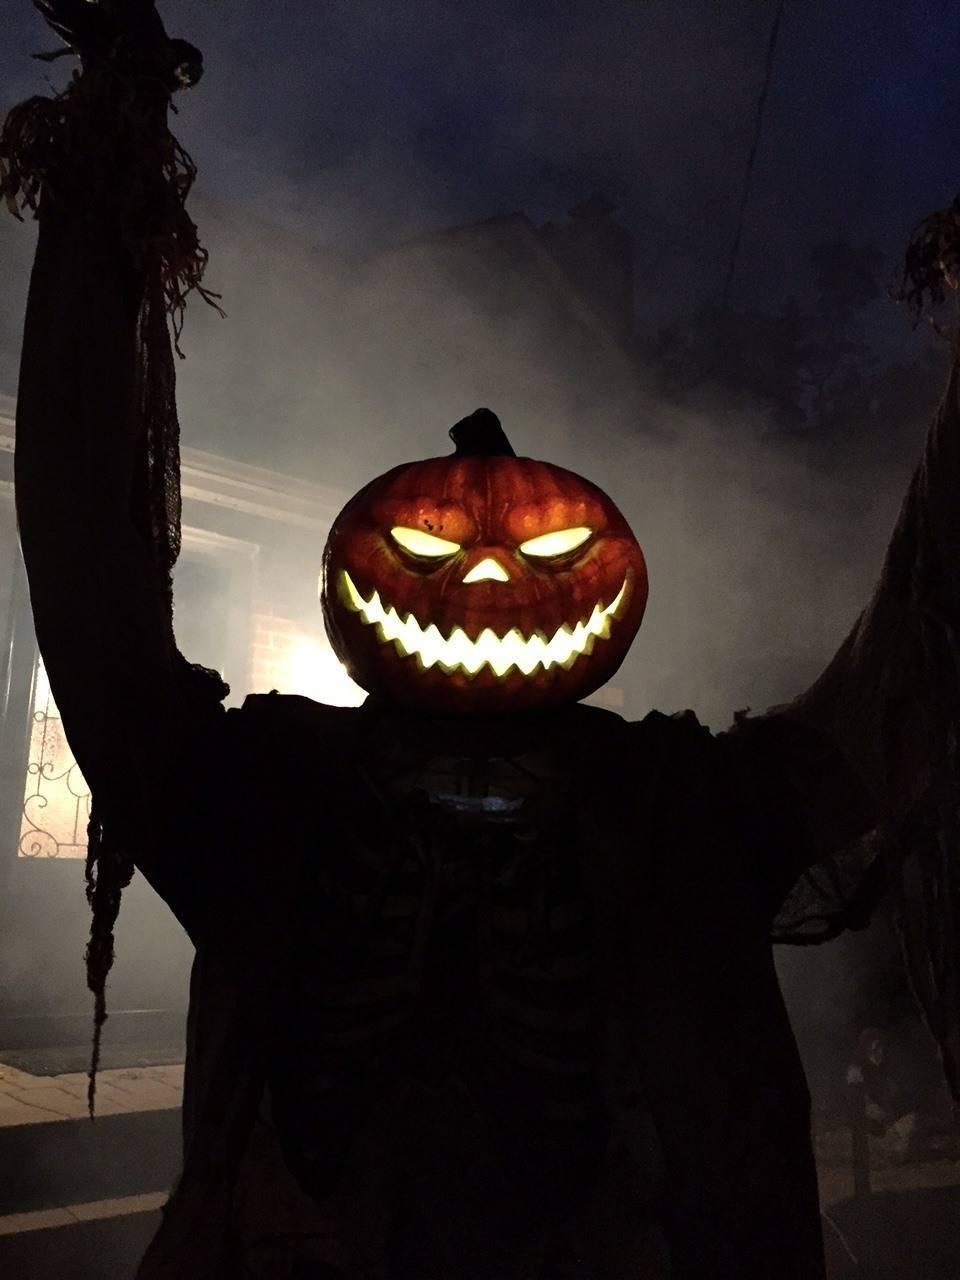 658574253ec3c78fa3e0_Halloween_2015_pumpkin_man.jpg